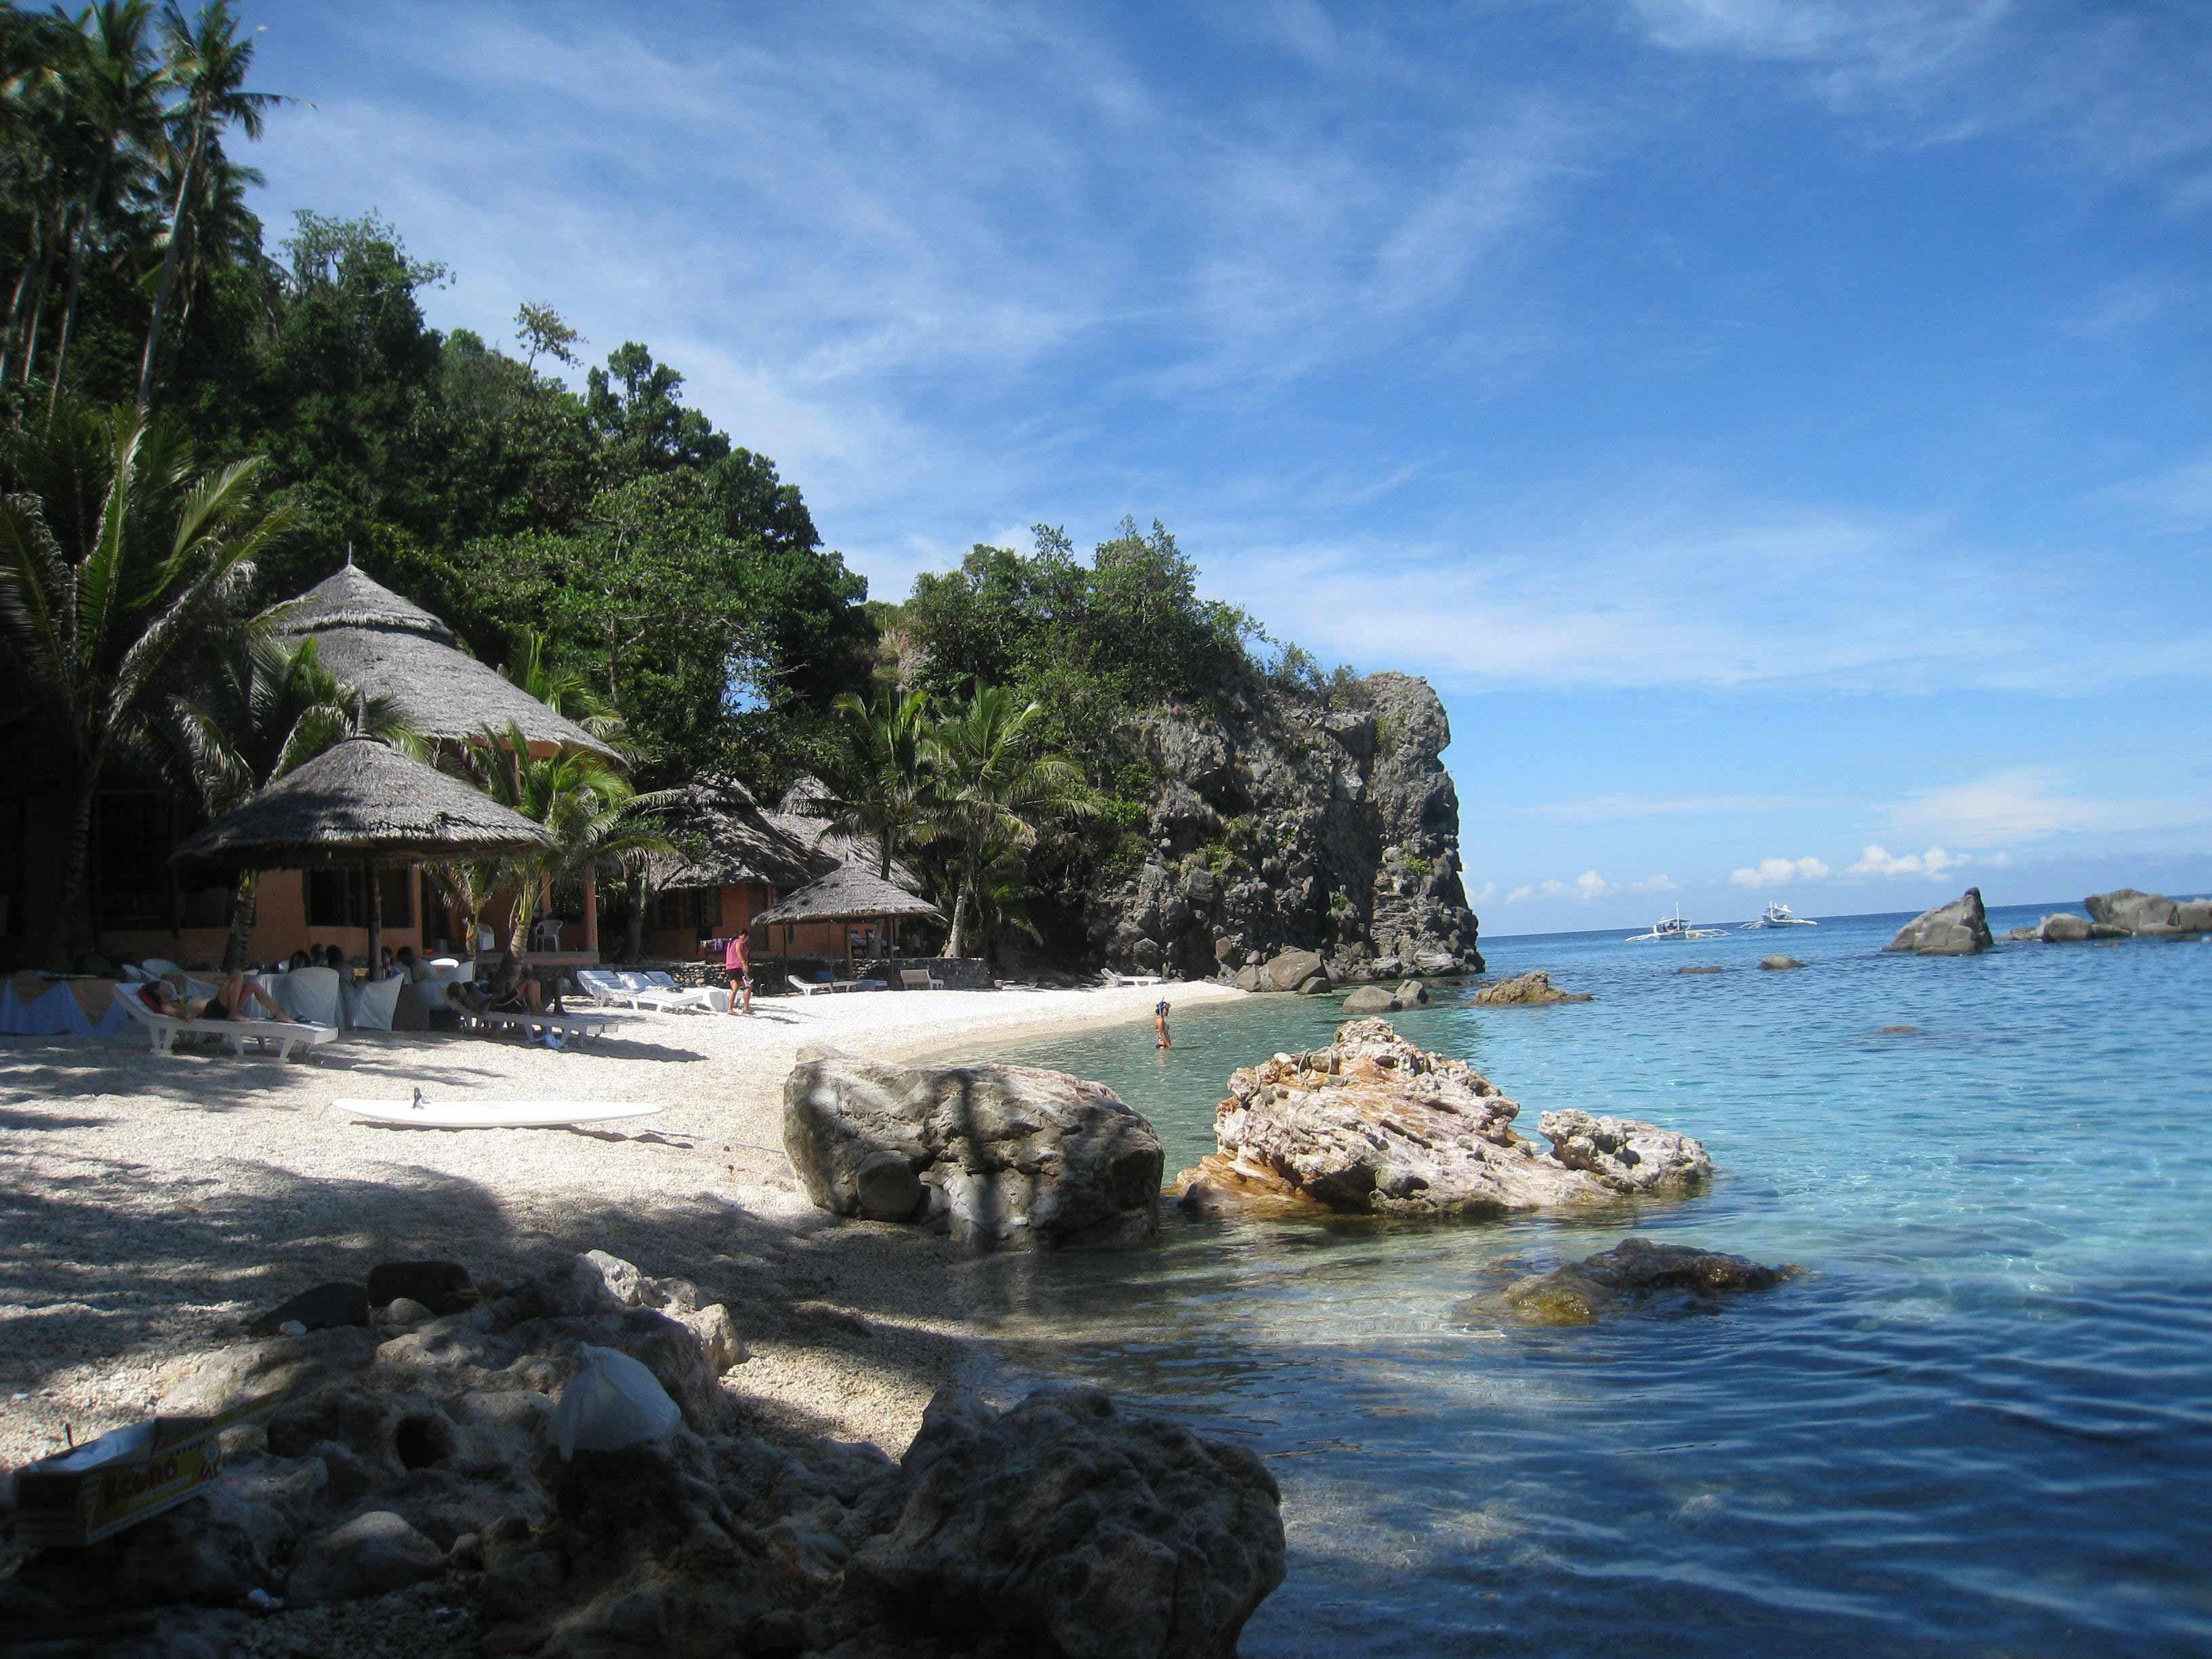 philippines thotos Peacebuilding, Environmental